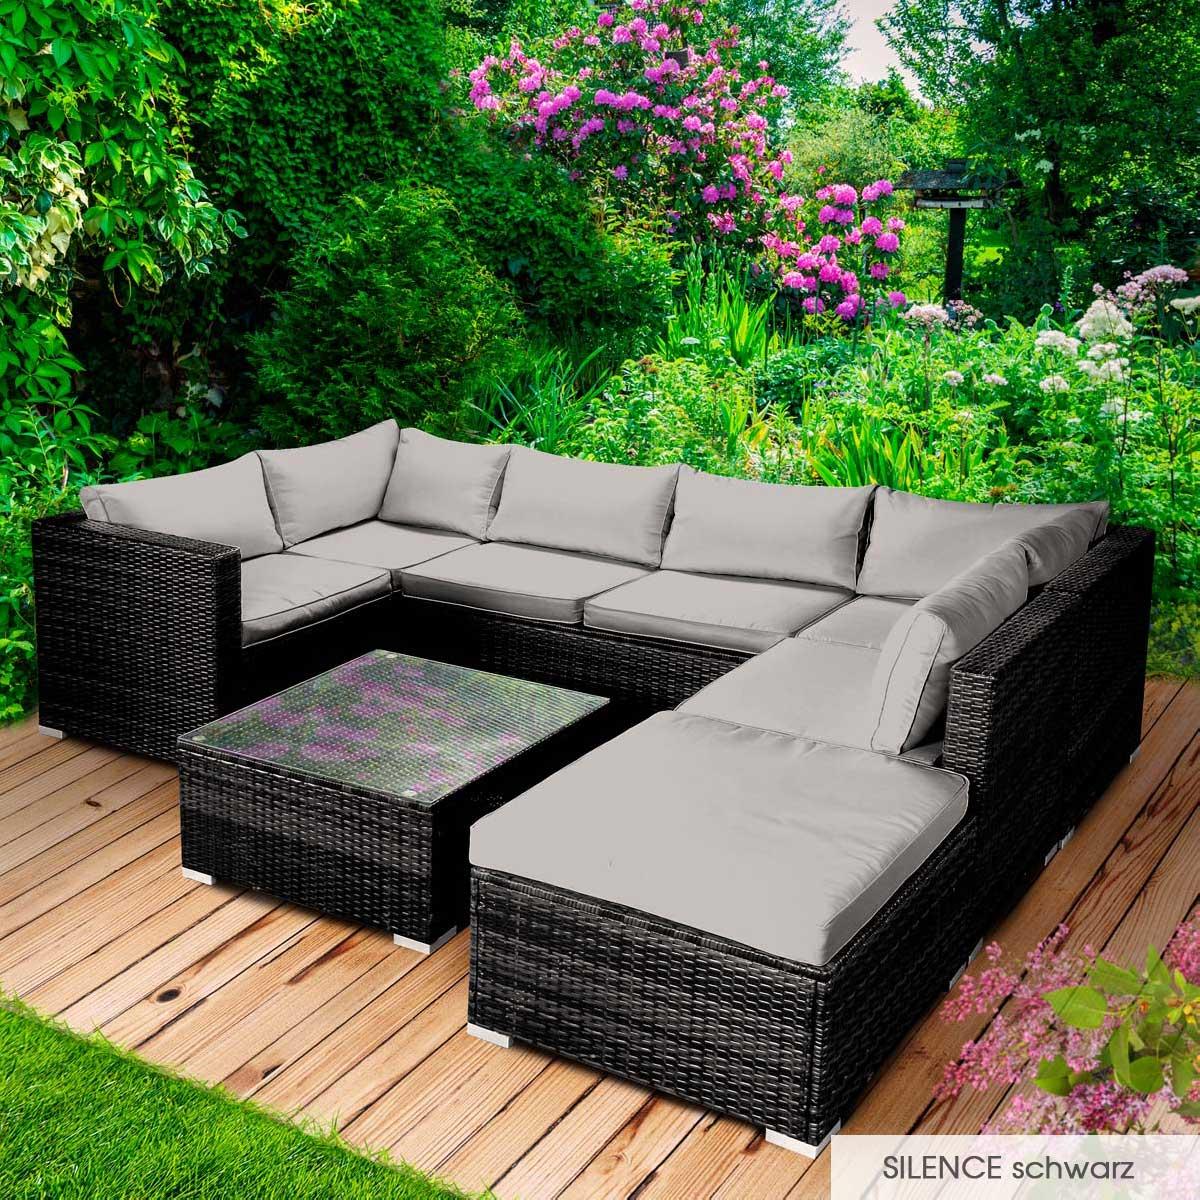 Gartenmoebel-Poly-Rattan-Lounge-Moebel-Sitzgarnitur-Gartengarnitur-Sitzgruppe-Sofa Indexbild 31